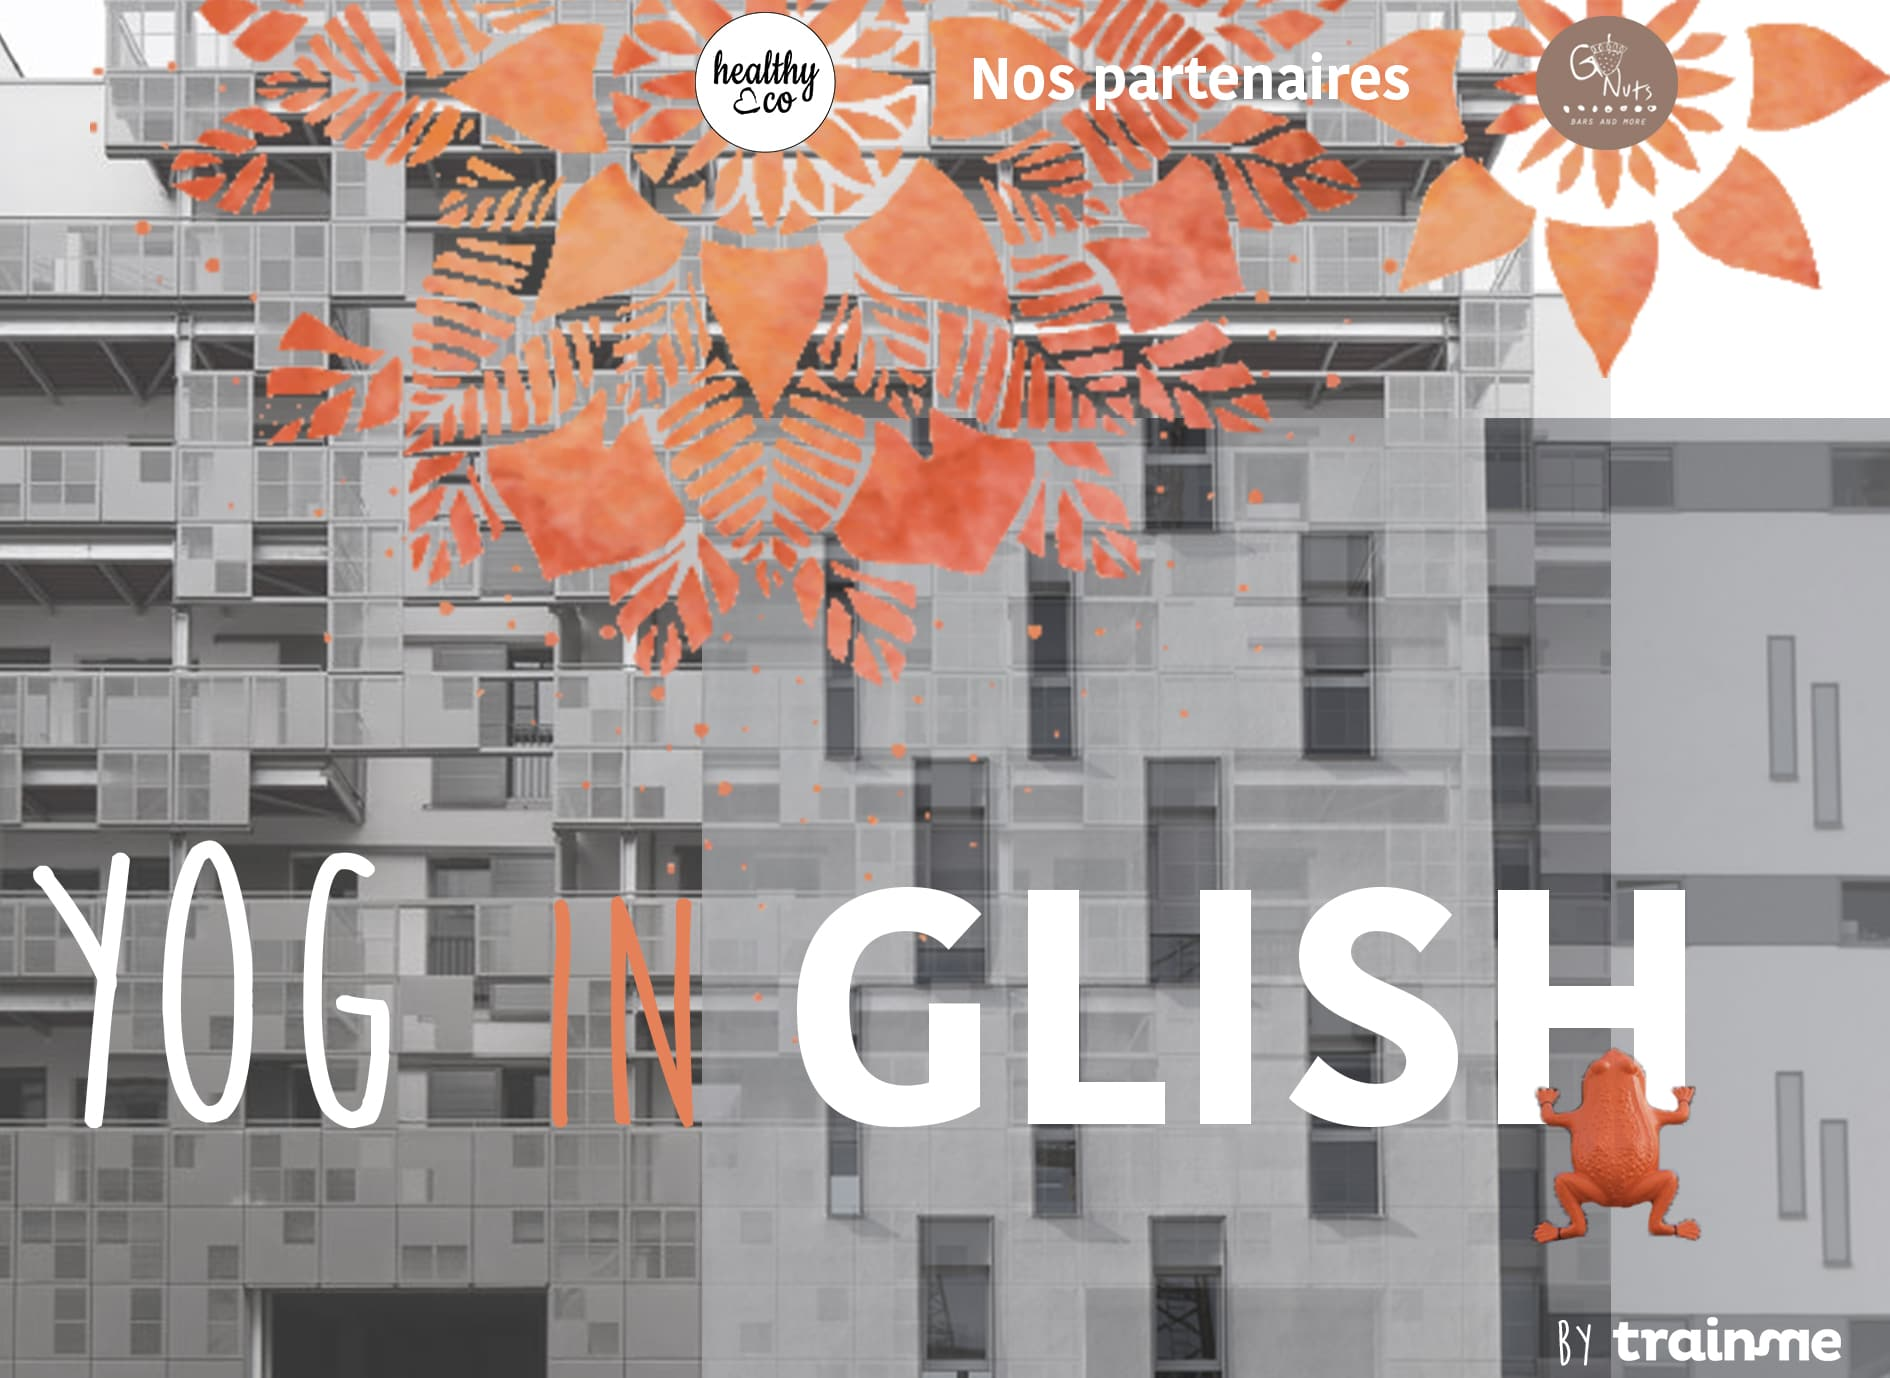 #1 Évènement sur Lyon : Yog In Glish